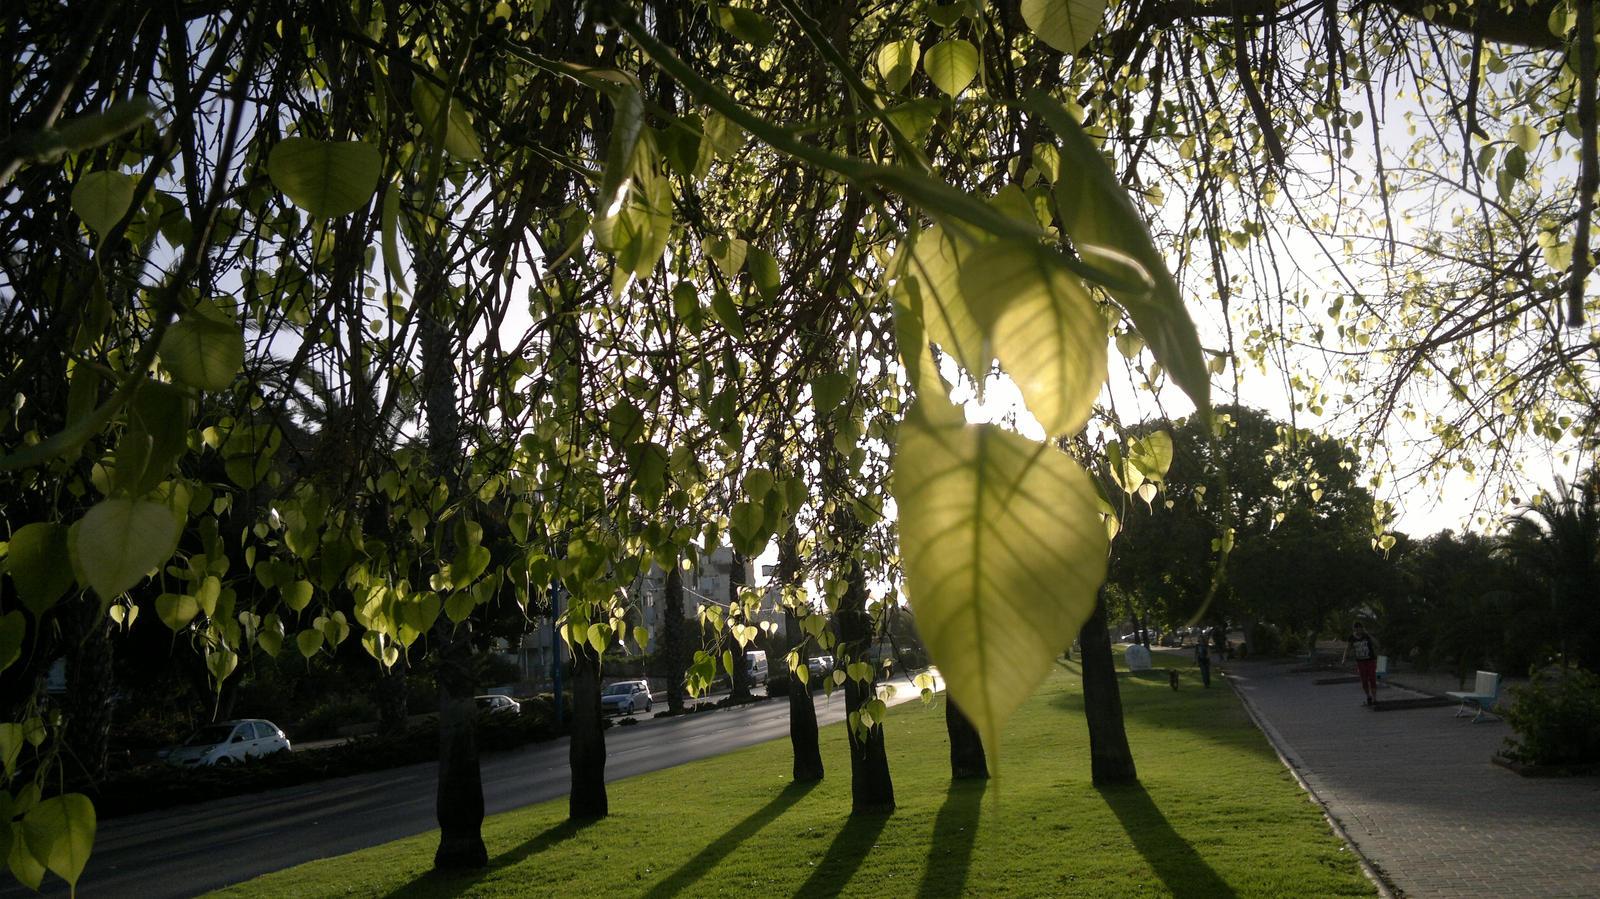 Green leaves 2. by Shantifiy